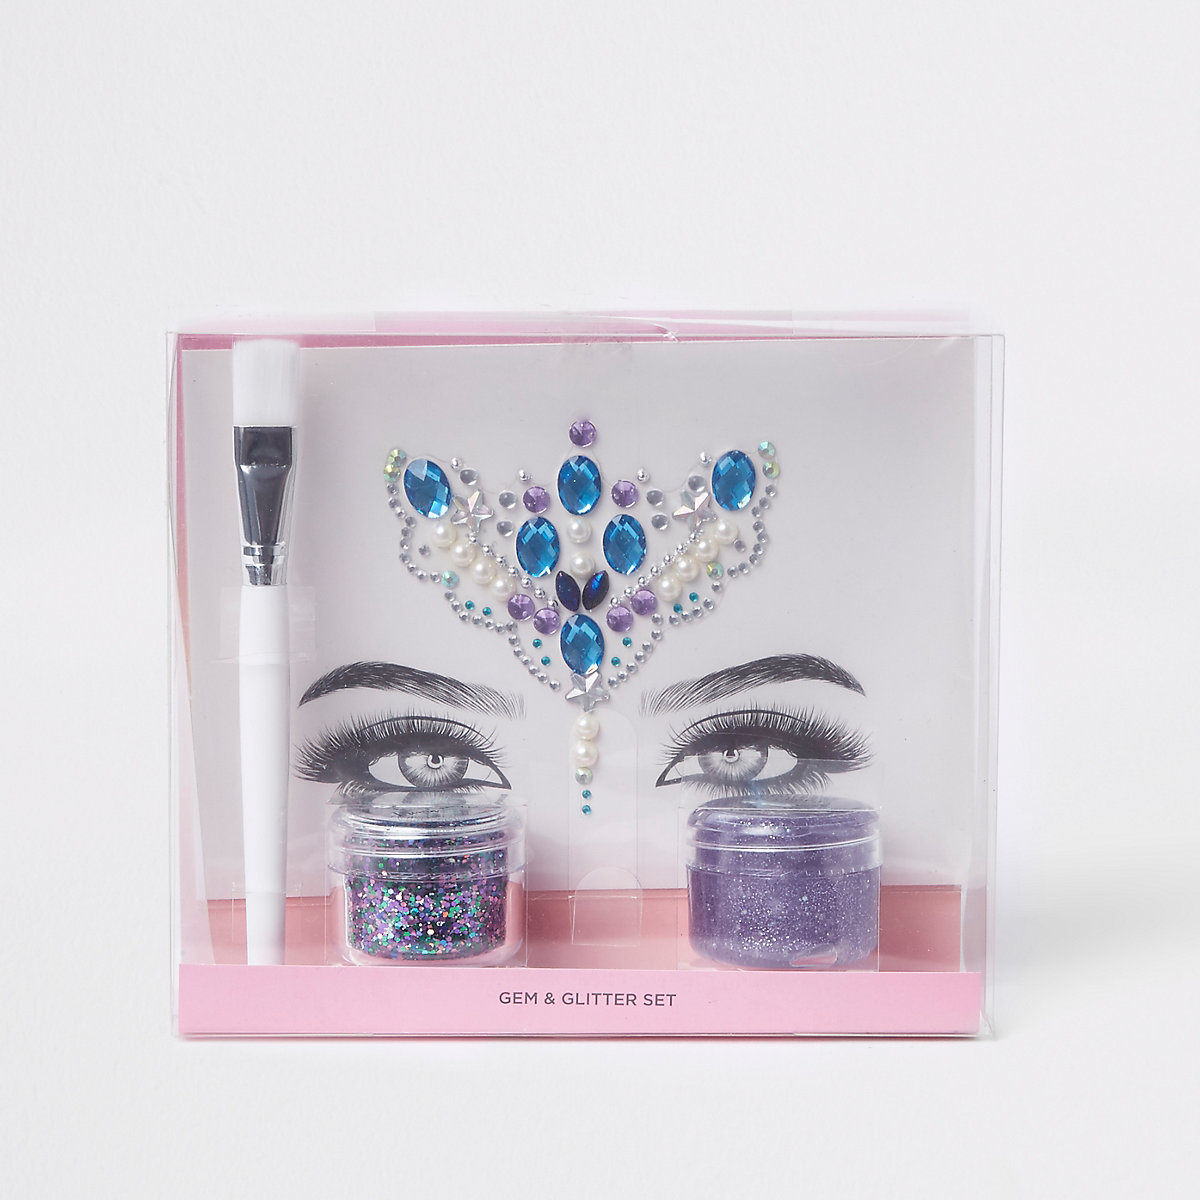 Prima glitter makeup set